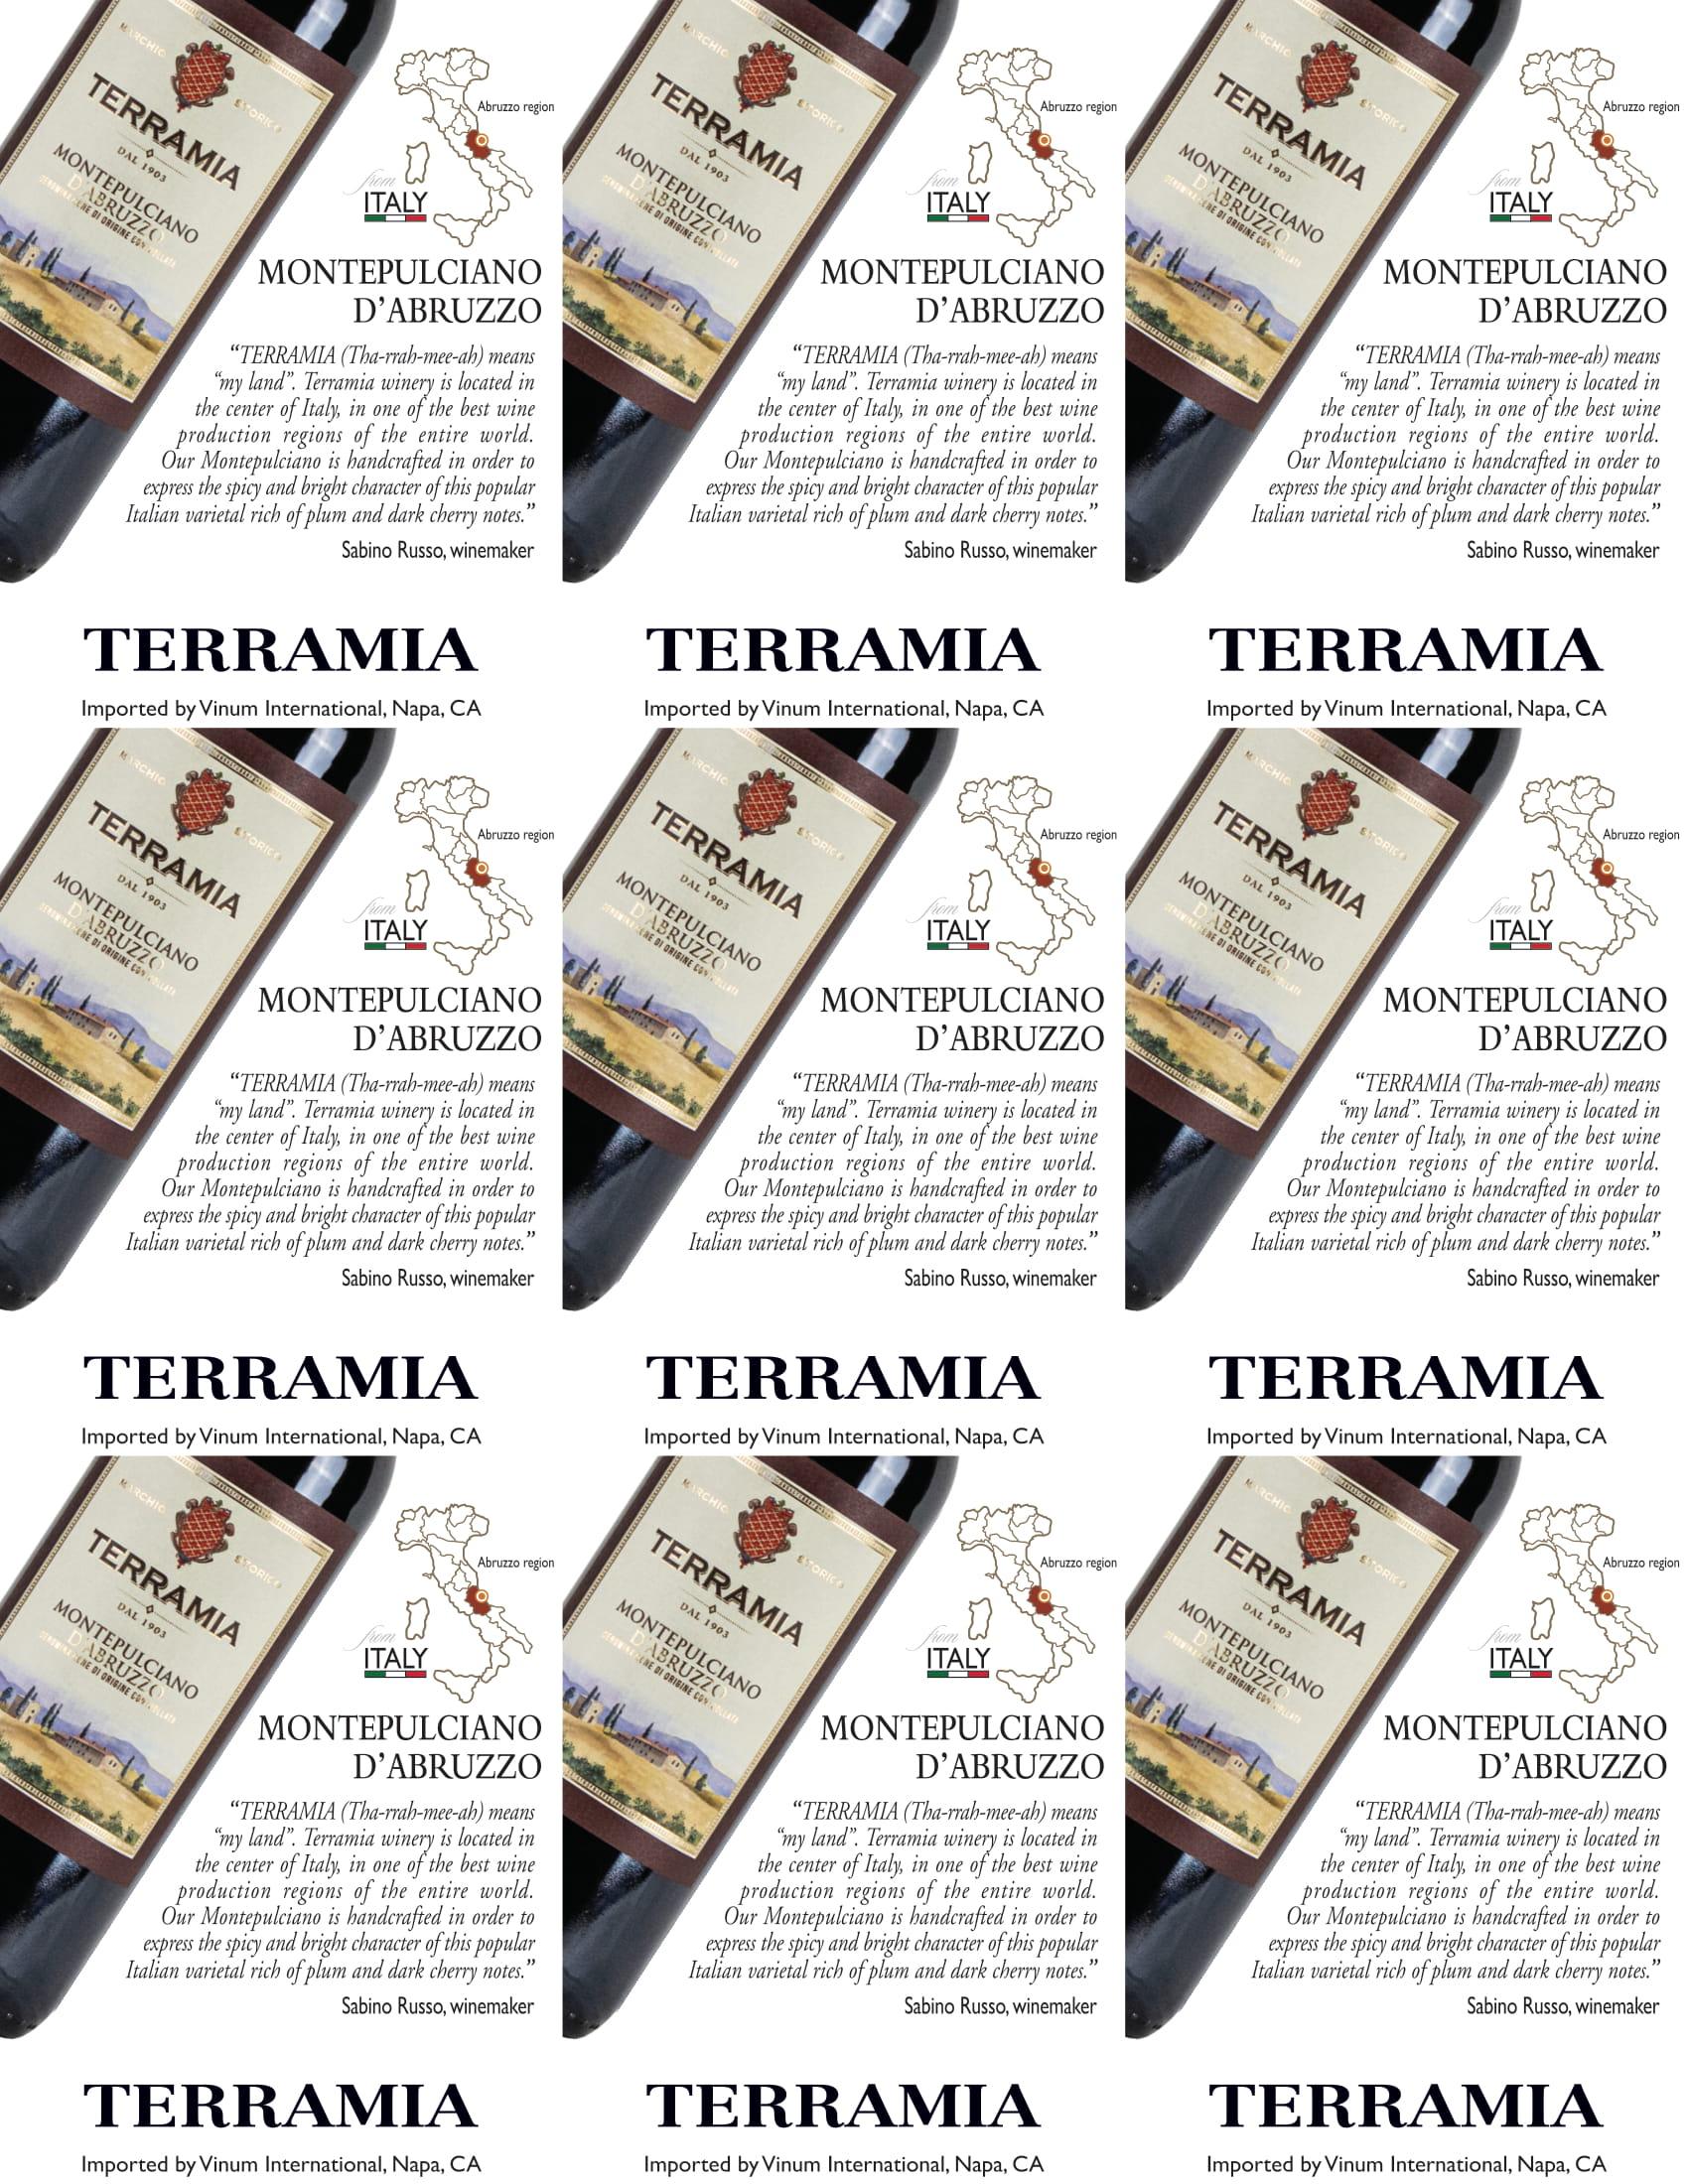 Terramia Montepulciano D'Abruzzo Shelf Talker